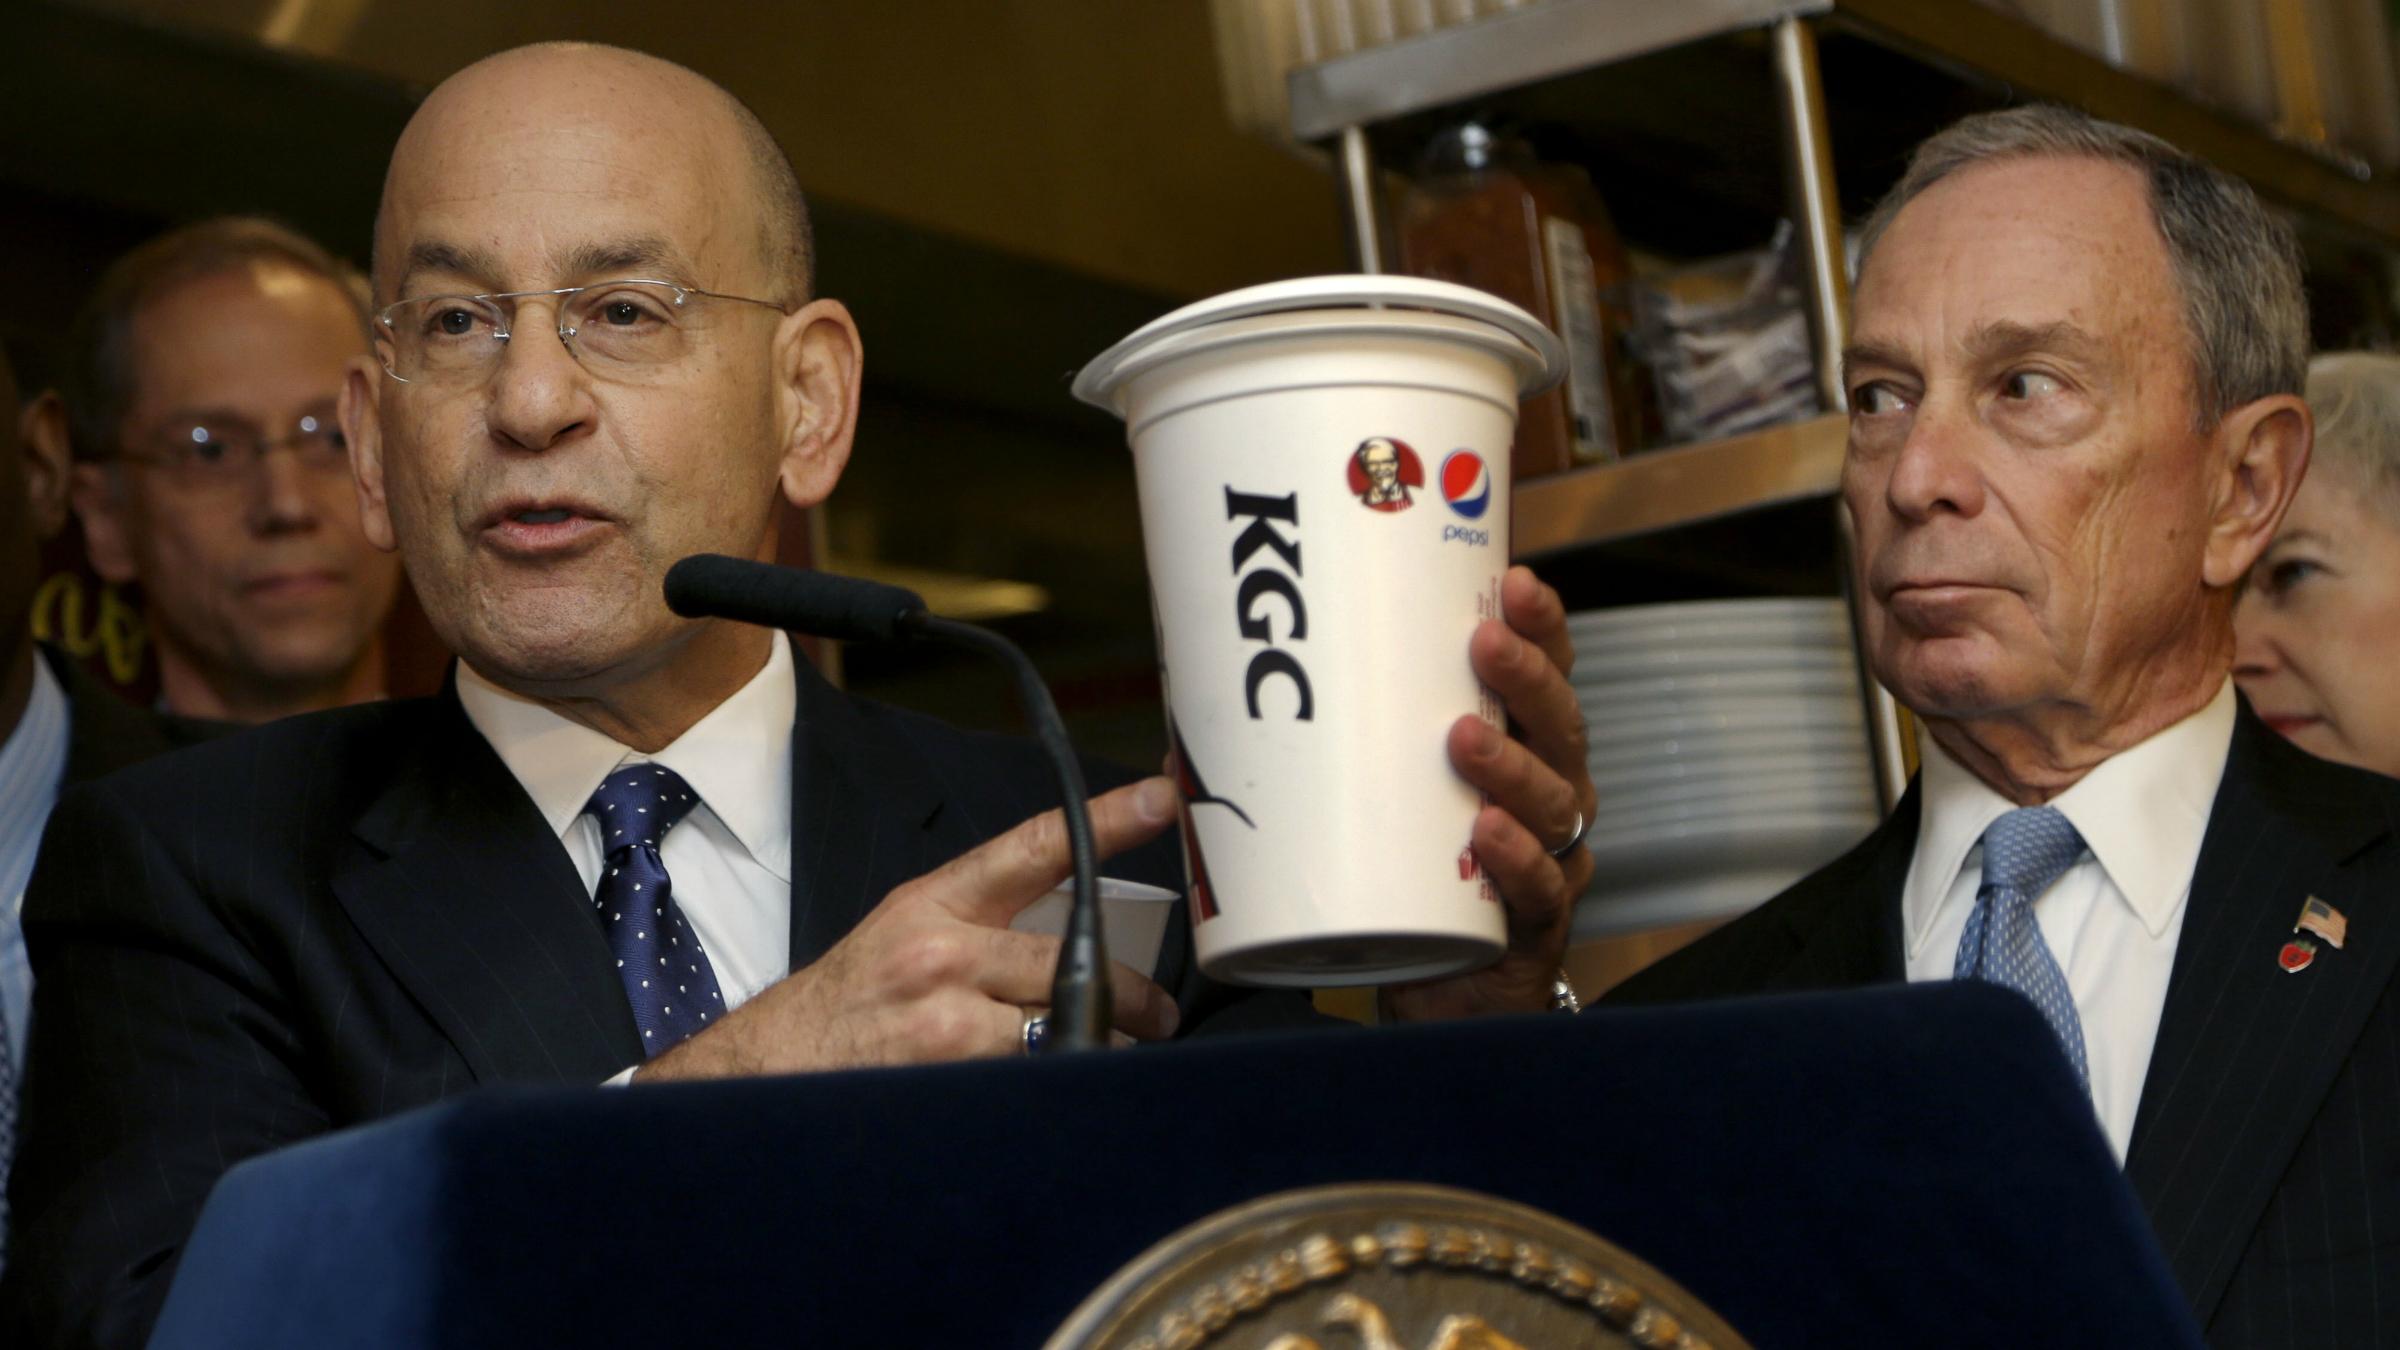 Bloomberg presser soda ban